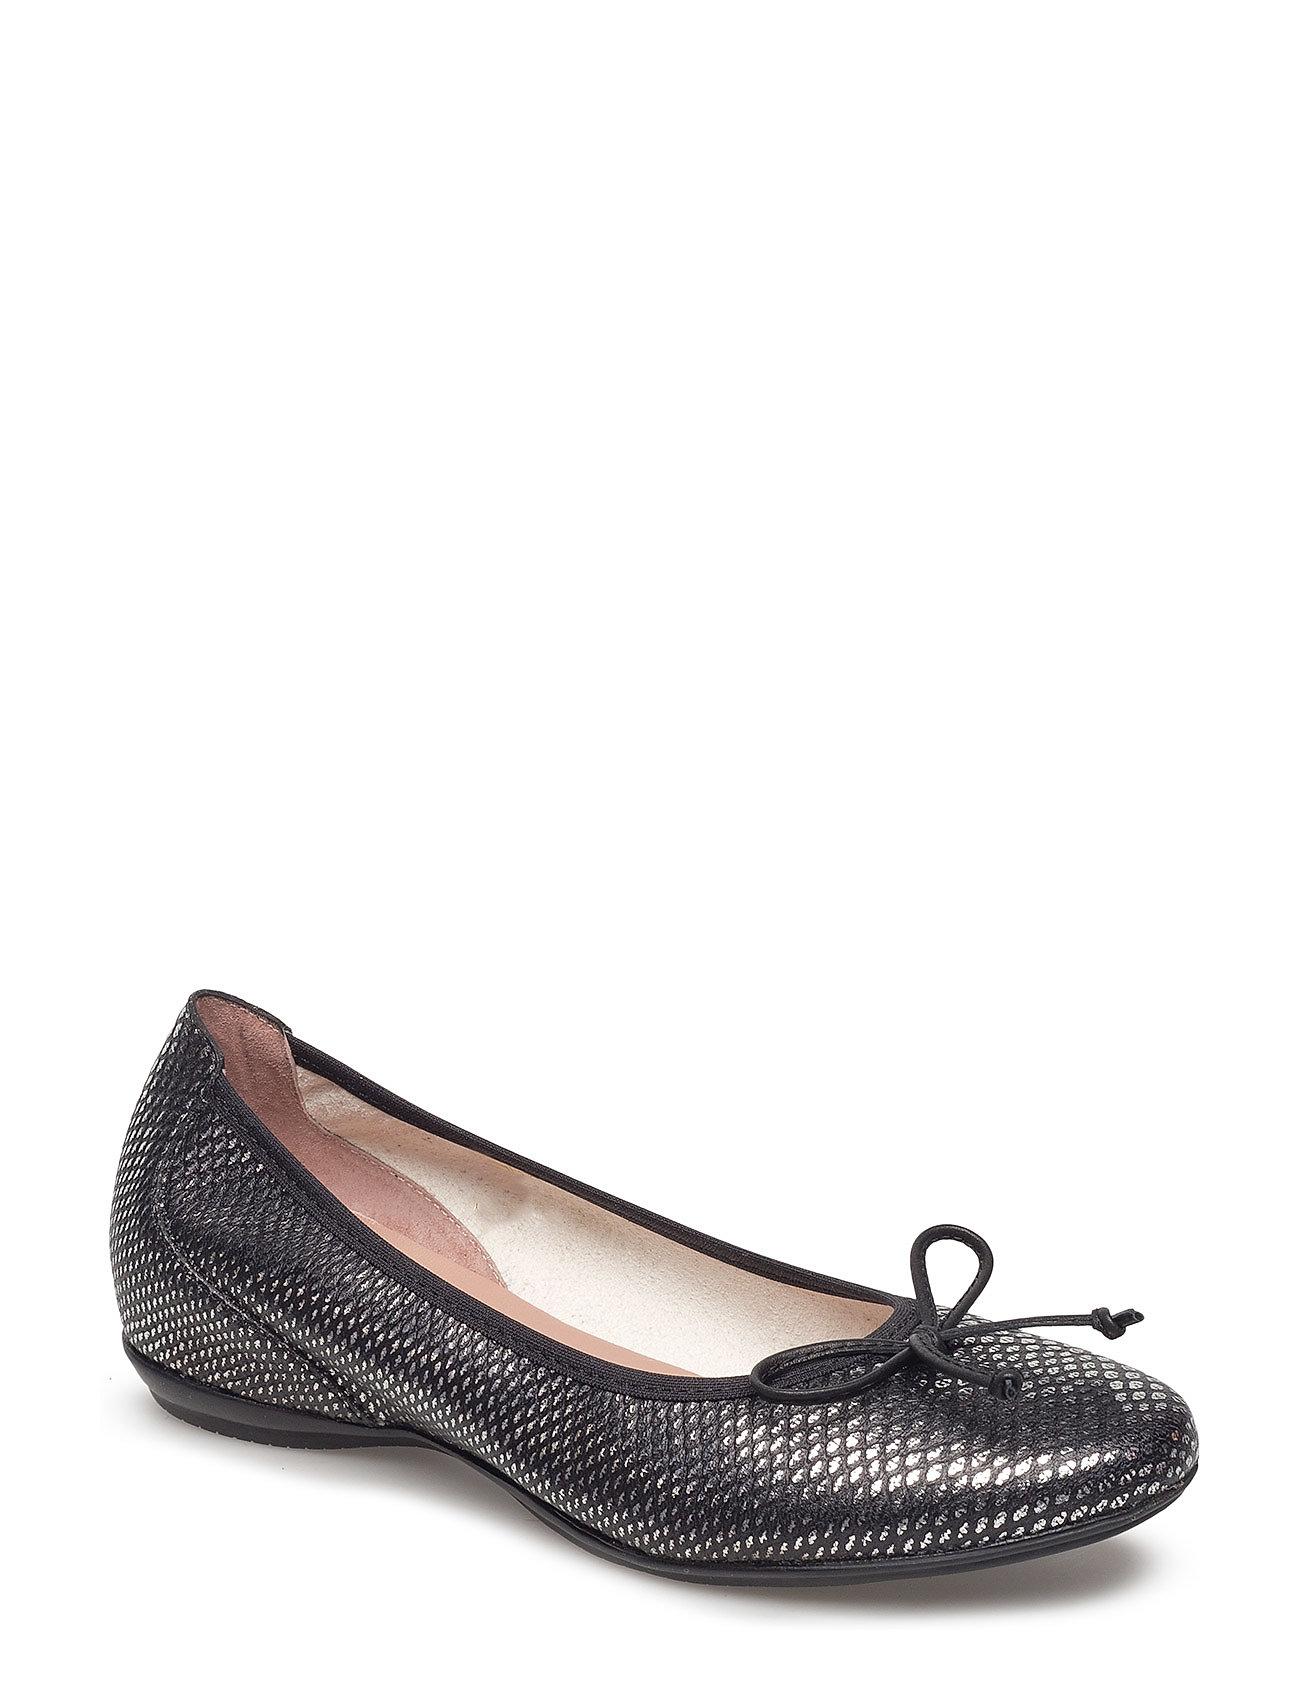 1d83c9c0ffa A-3093 ballerina sko fra Wonders til dame i CARUNG NEGRO - Pashion.dk